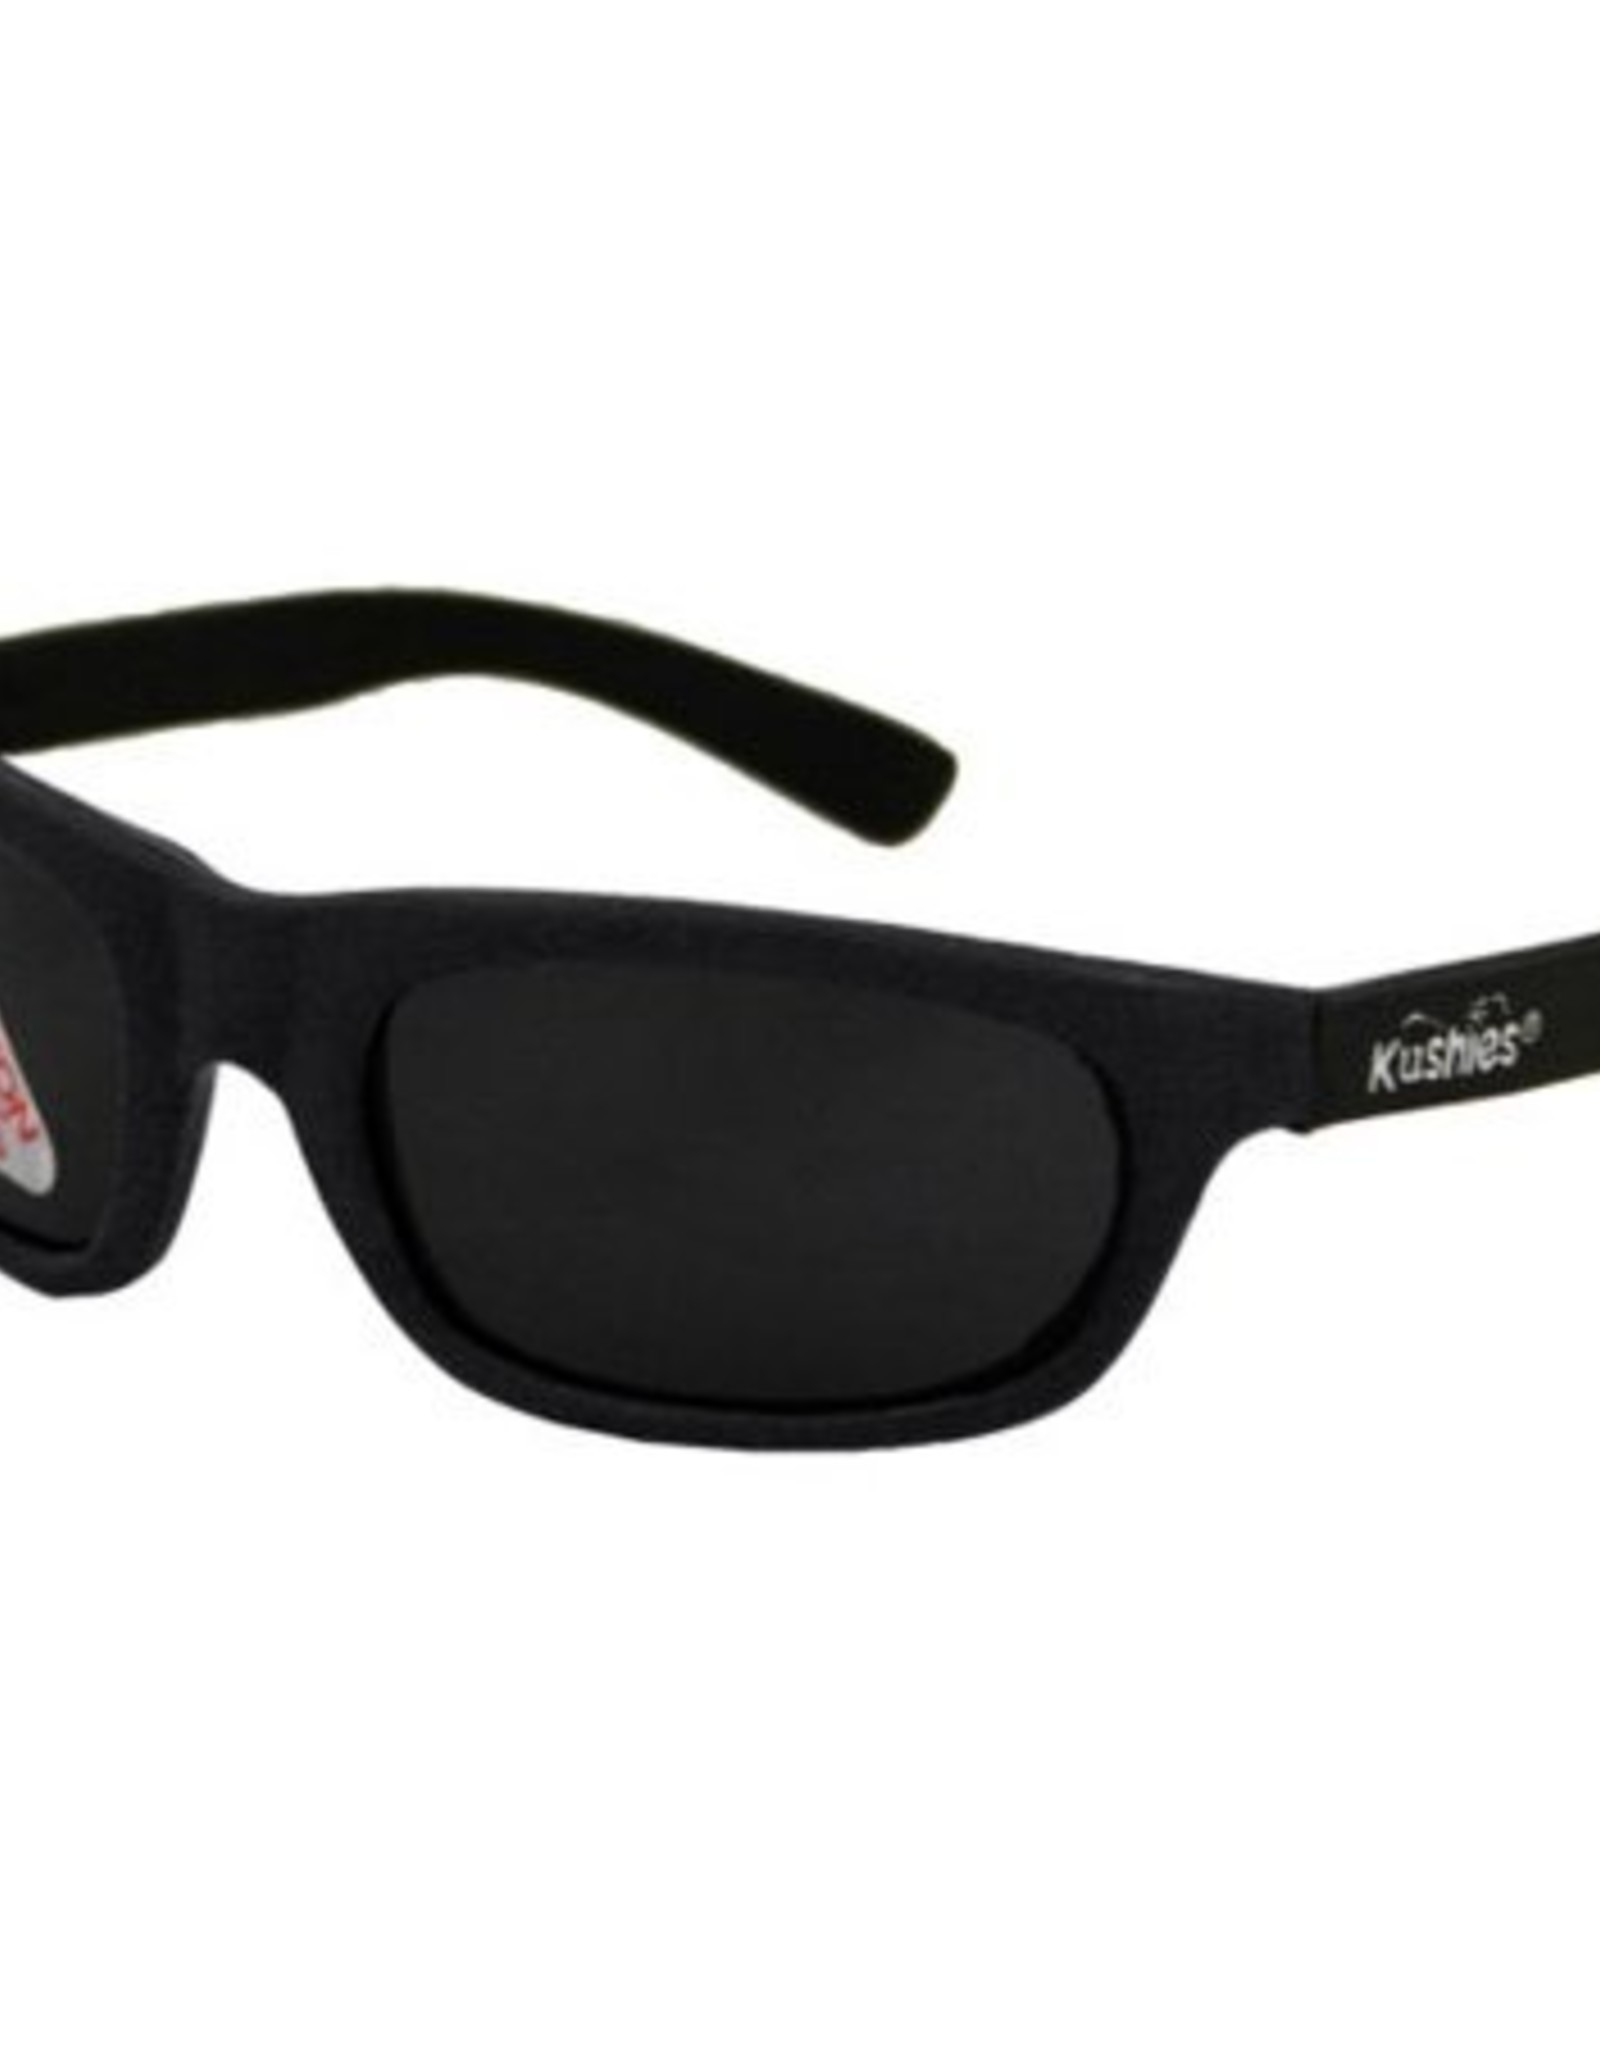 Kushies Baby & Toddler Sunglasses - Black or Pink